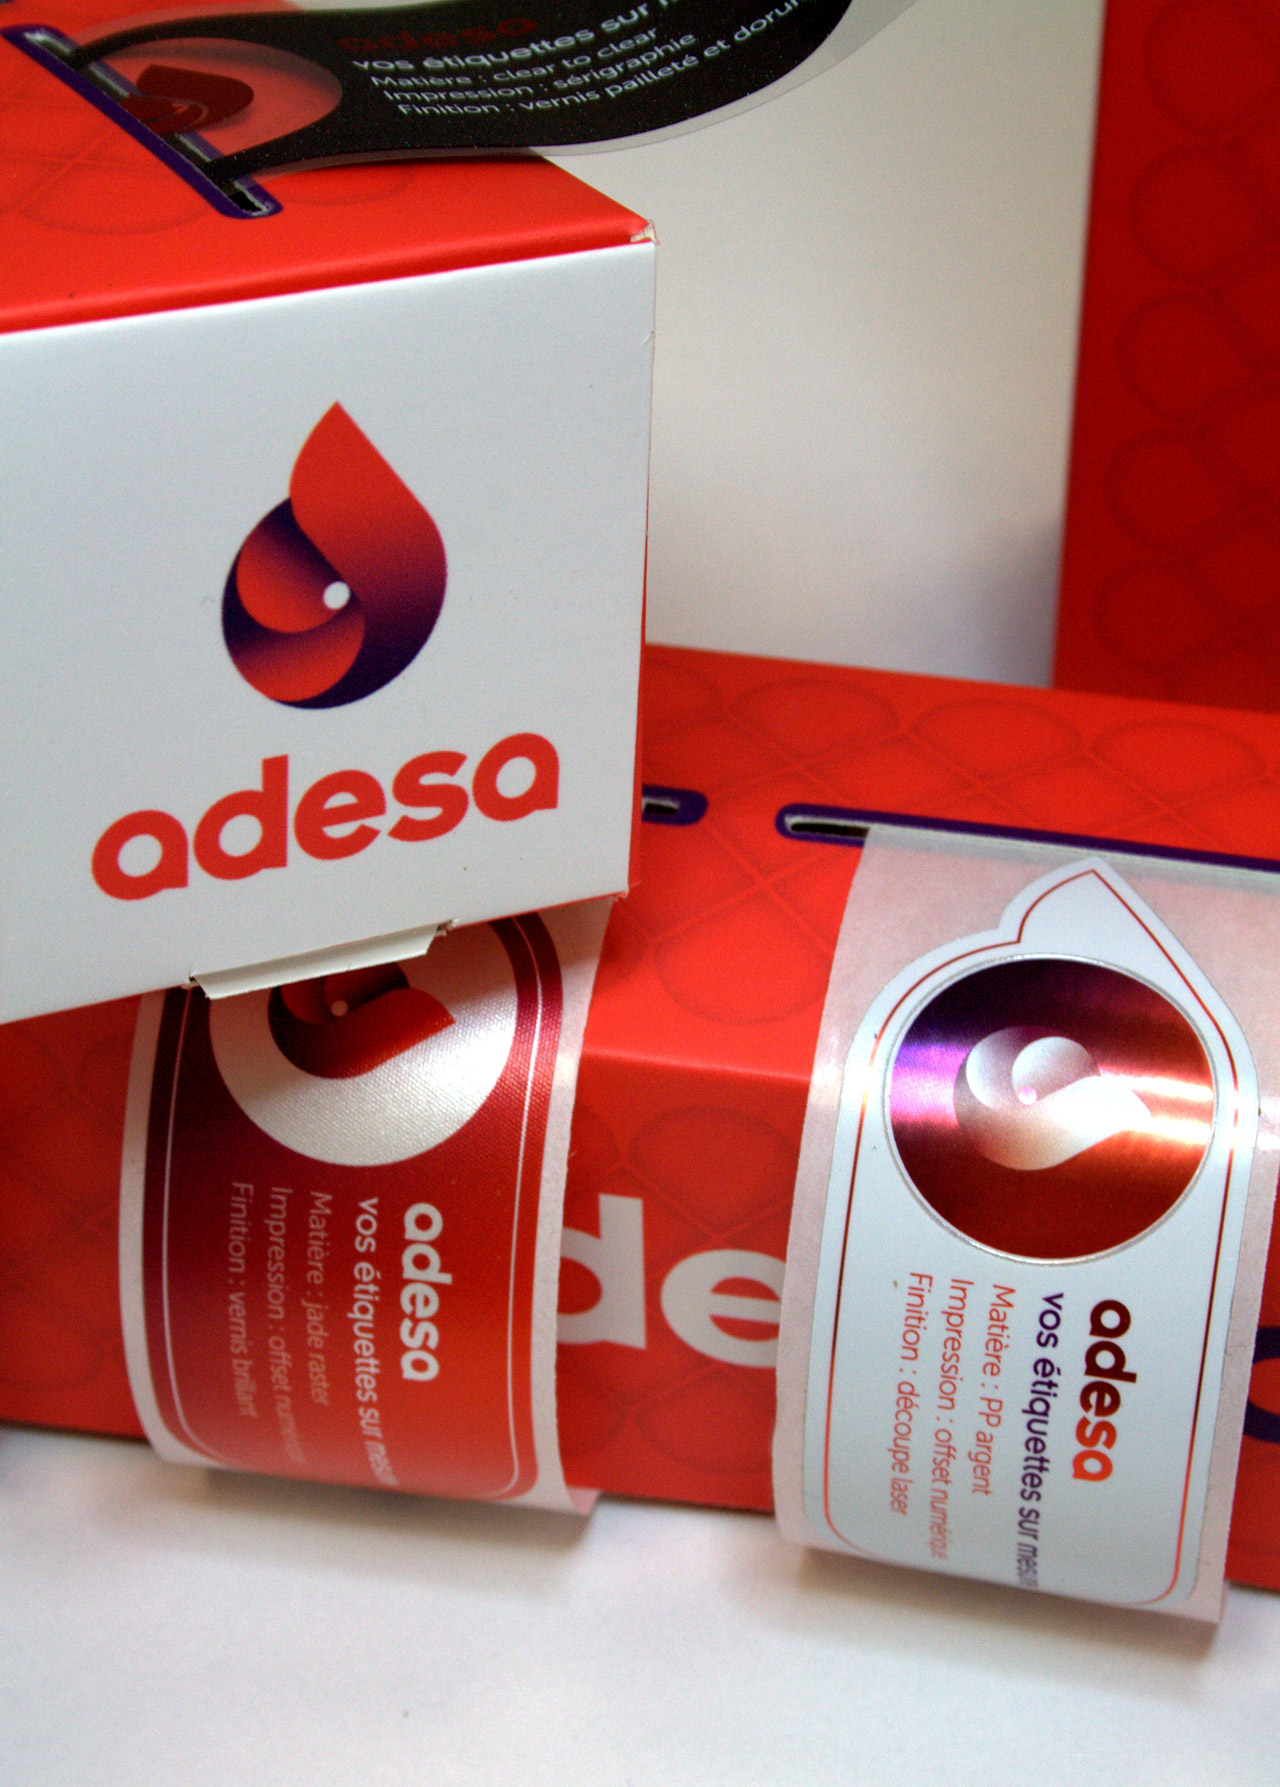 adesa-creation-packaging-etiquettes-caconcept-alexis-cretin-2